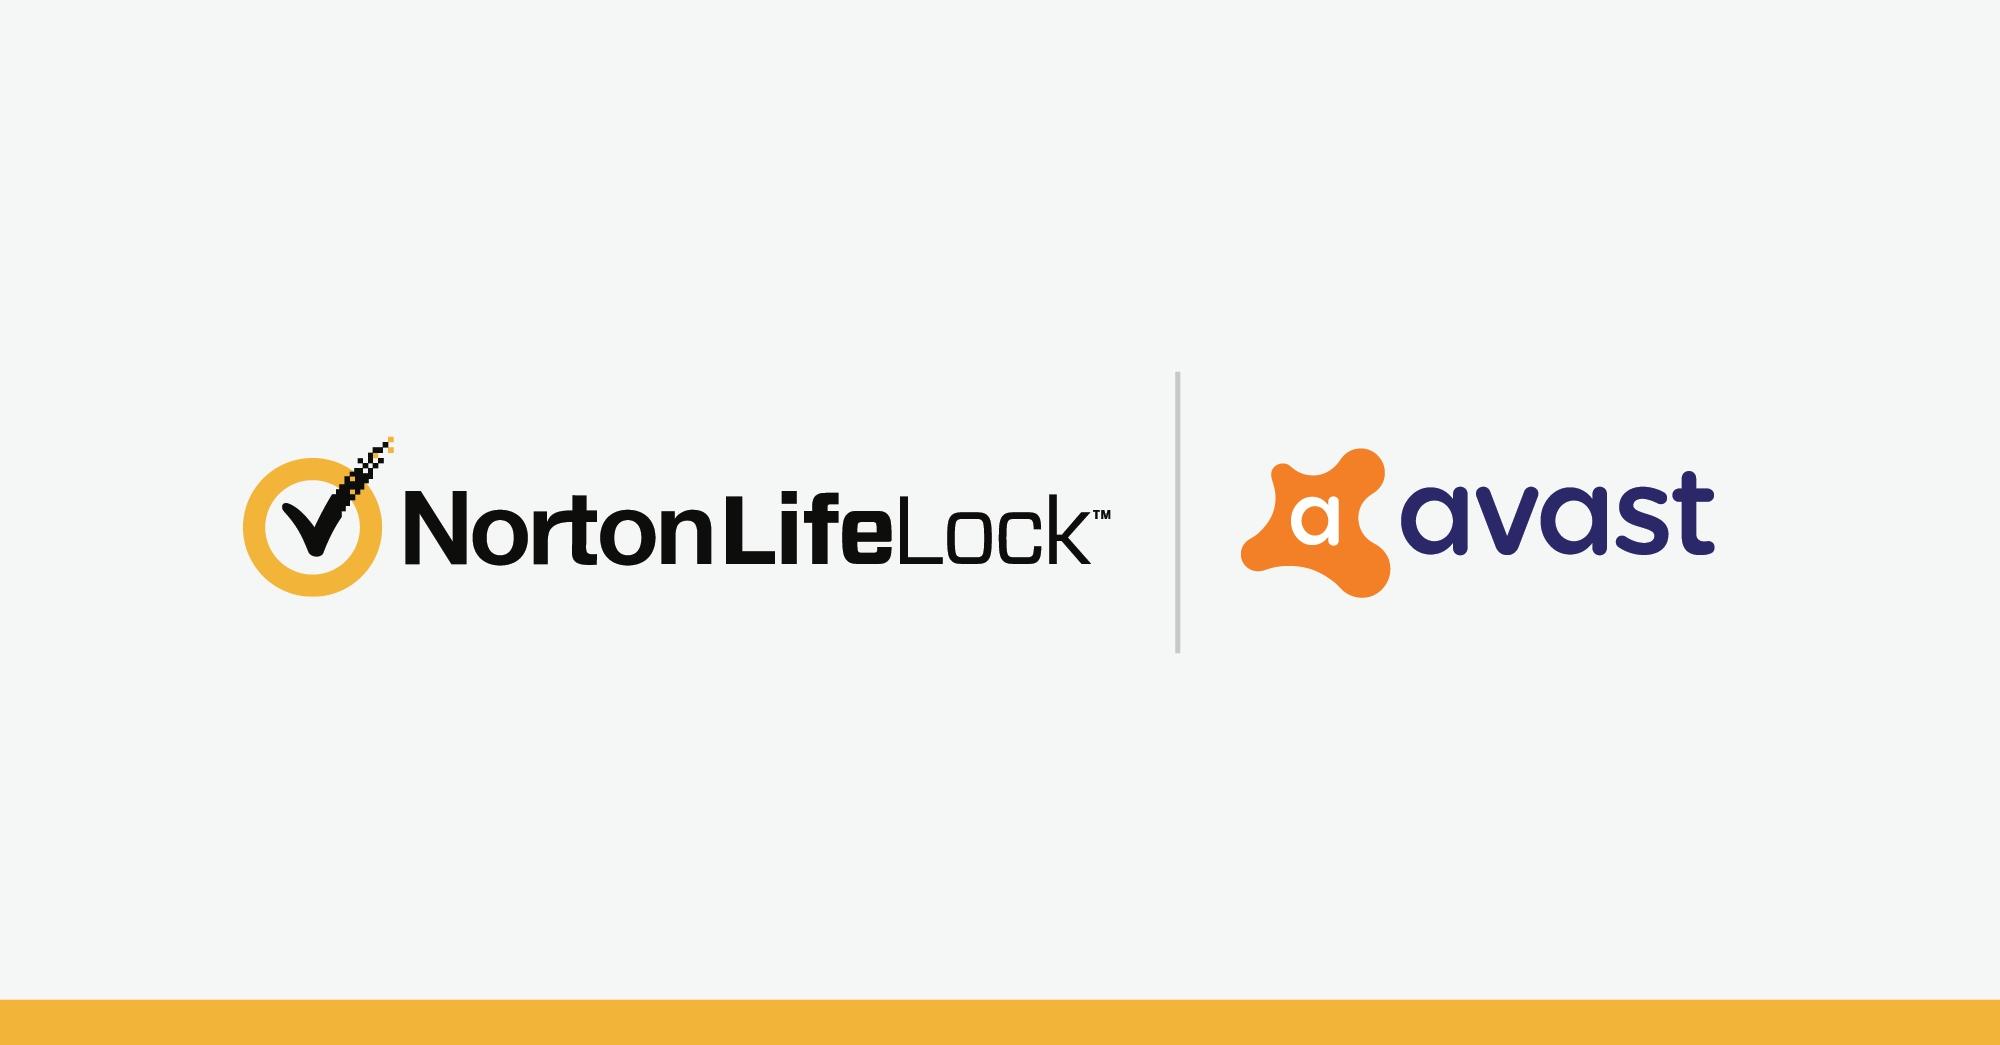 Norton antivírus compra Avast por US$ 8 bilhões